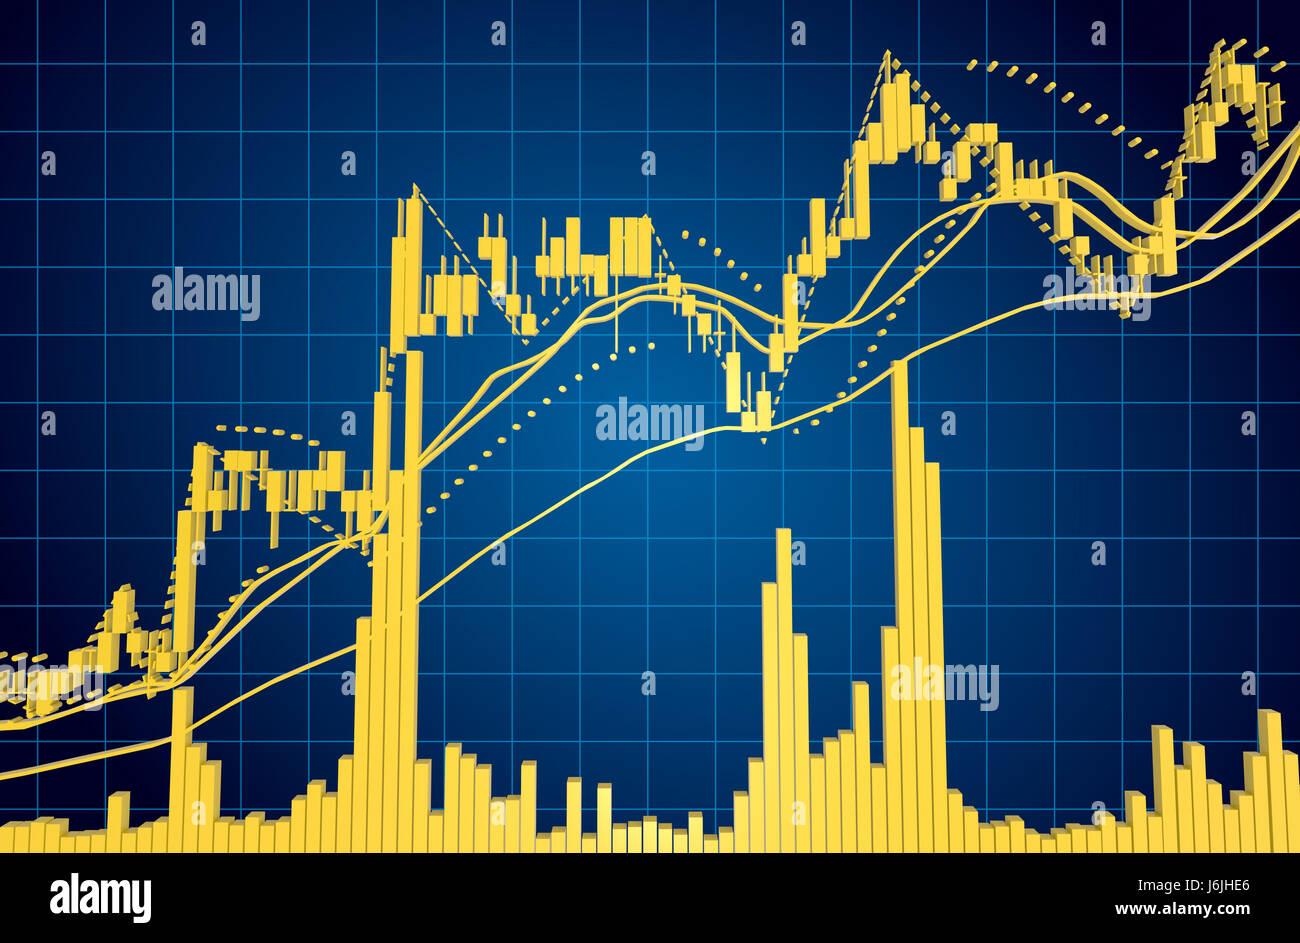 Stock market indicators day trading